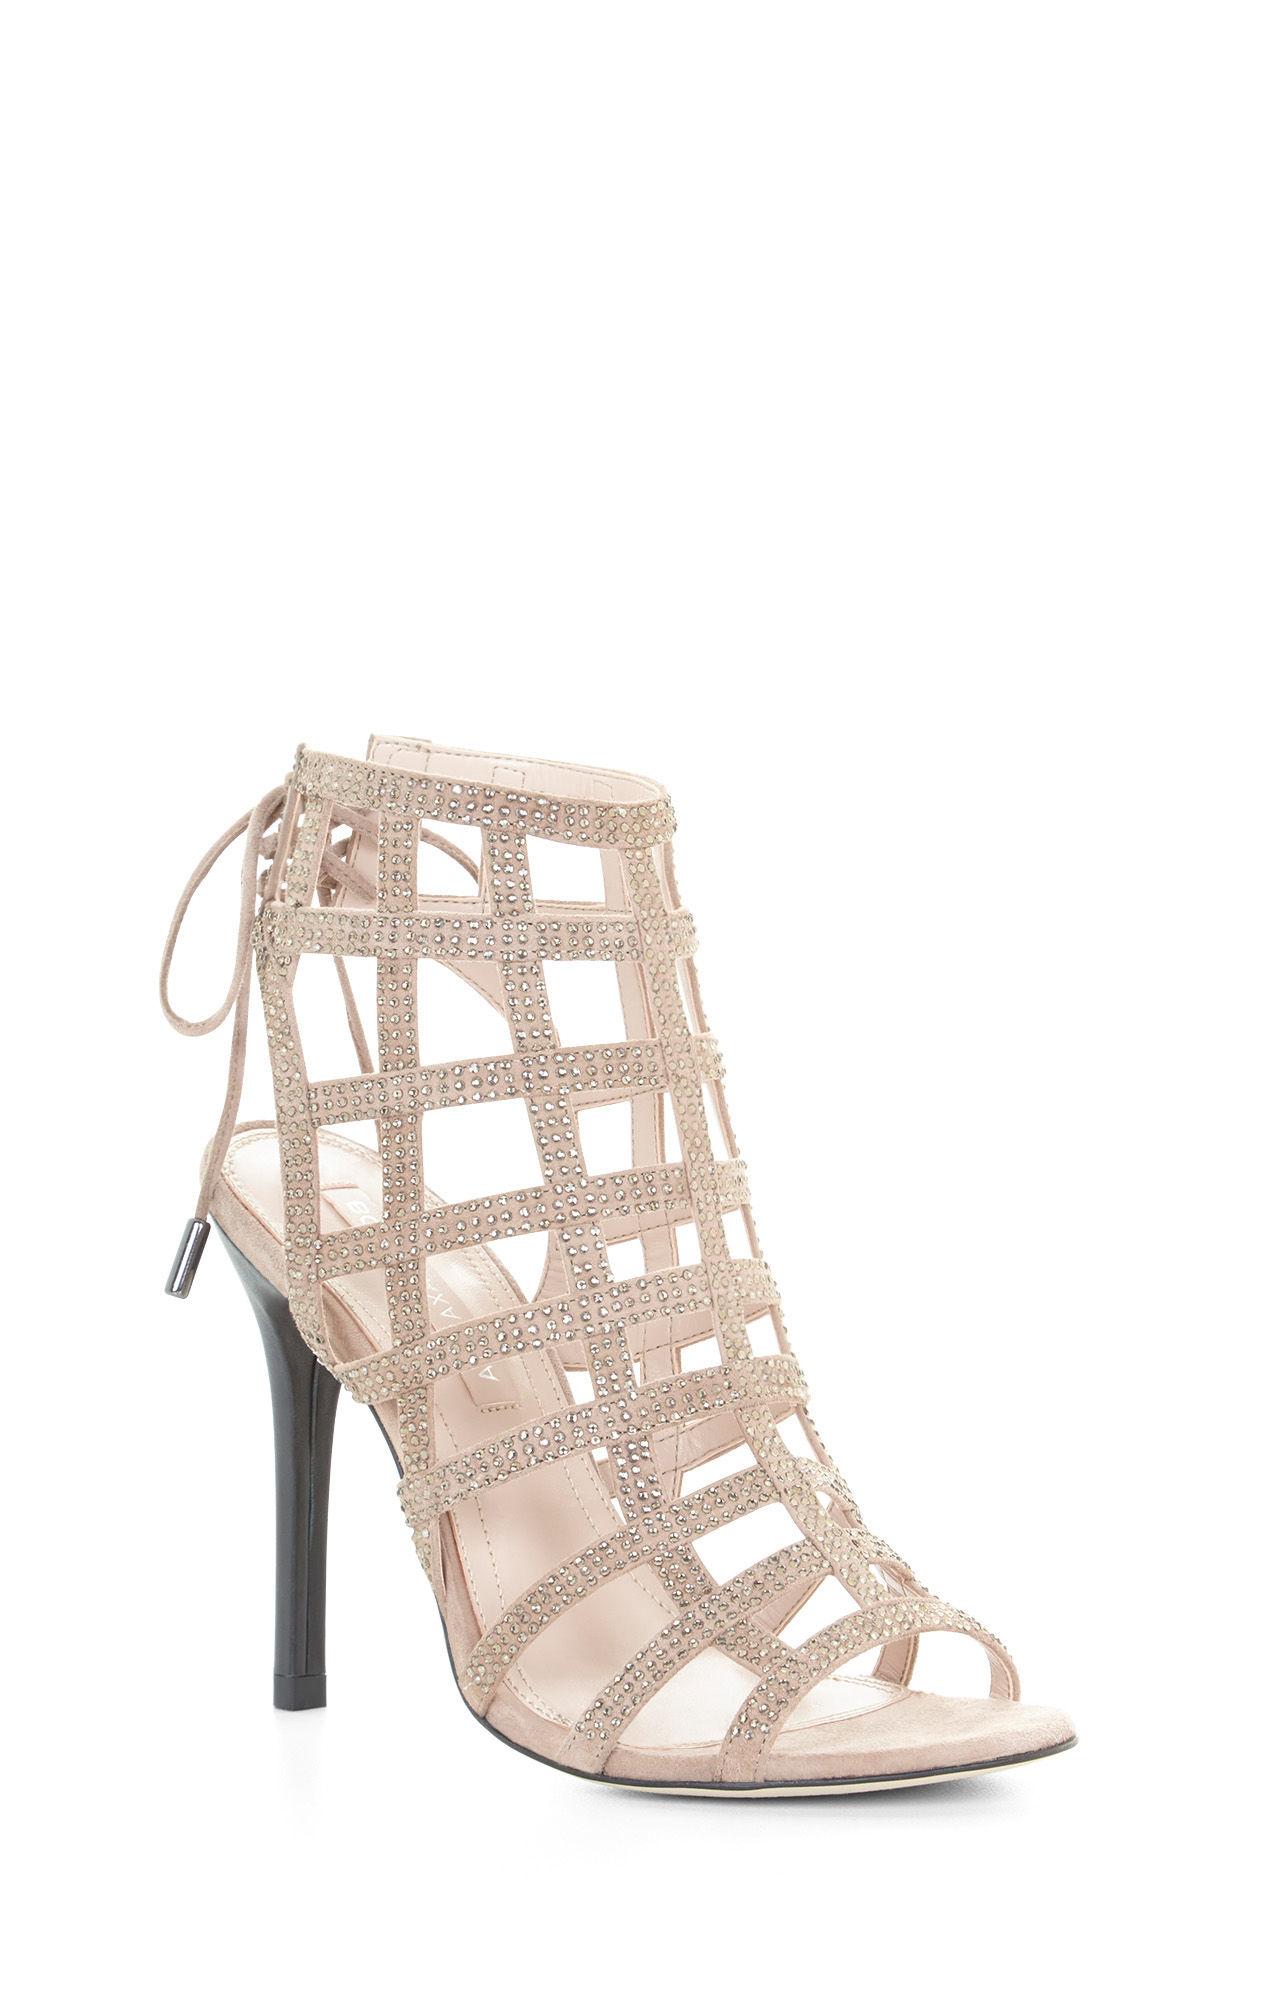 bc64020e3bfc53 Lyst bcbgmaxazria lien high heel caged sandal in natural jpg 1268x1992 Bcbg  natural heels